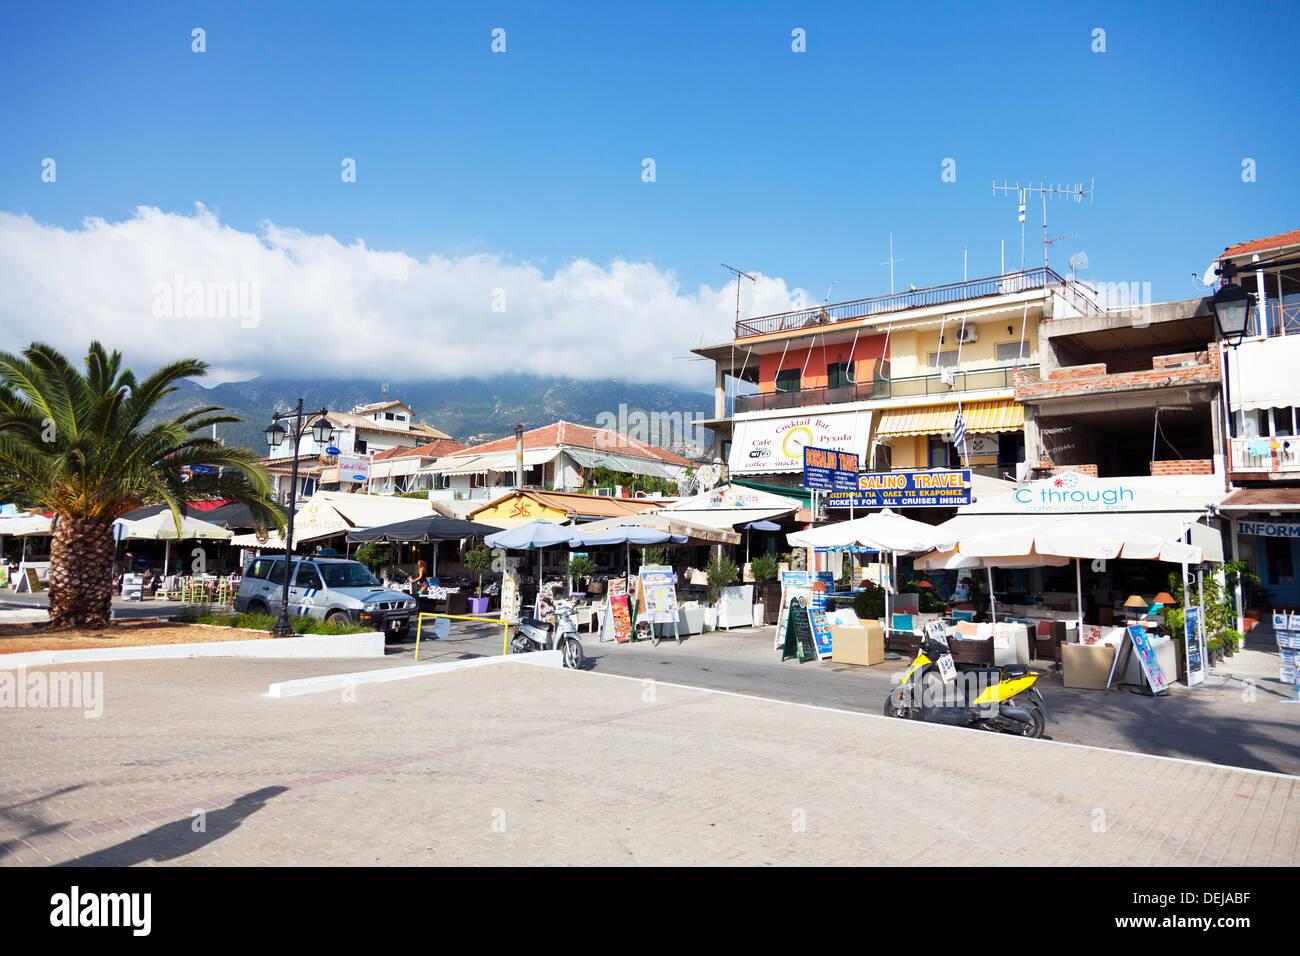 Nidri Tavernas and restaurants on harbour front Lefkas Lefkada Greek Island Greece Nydri - Stock Image